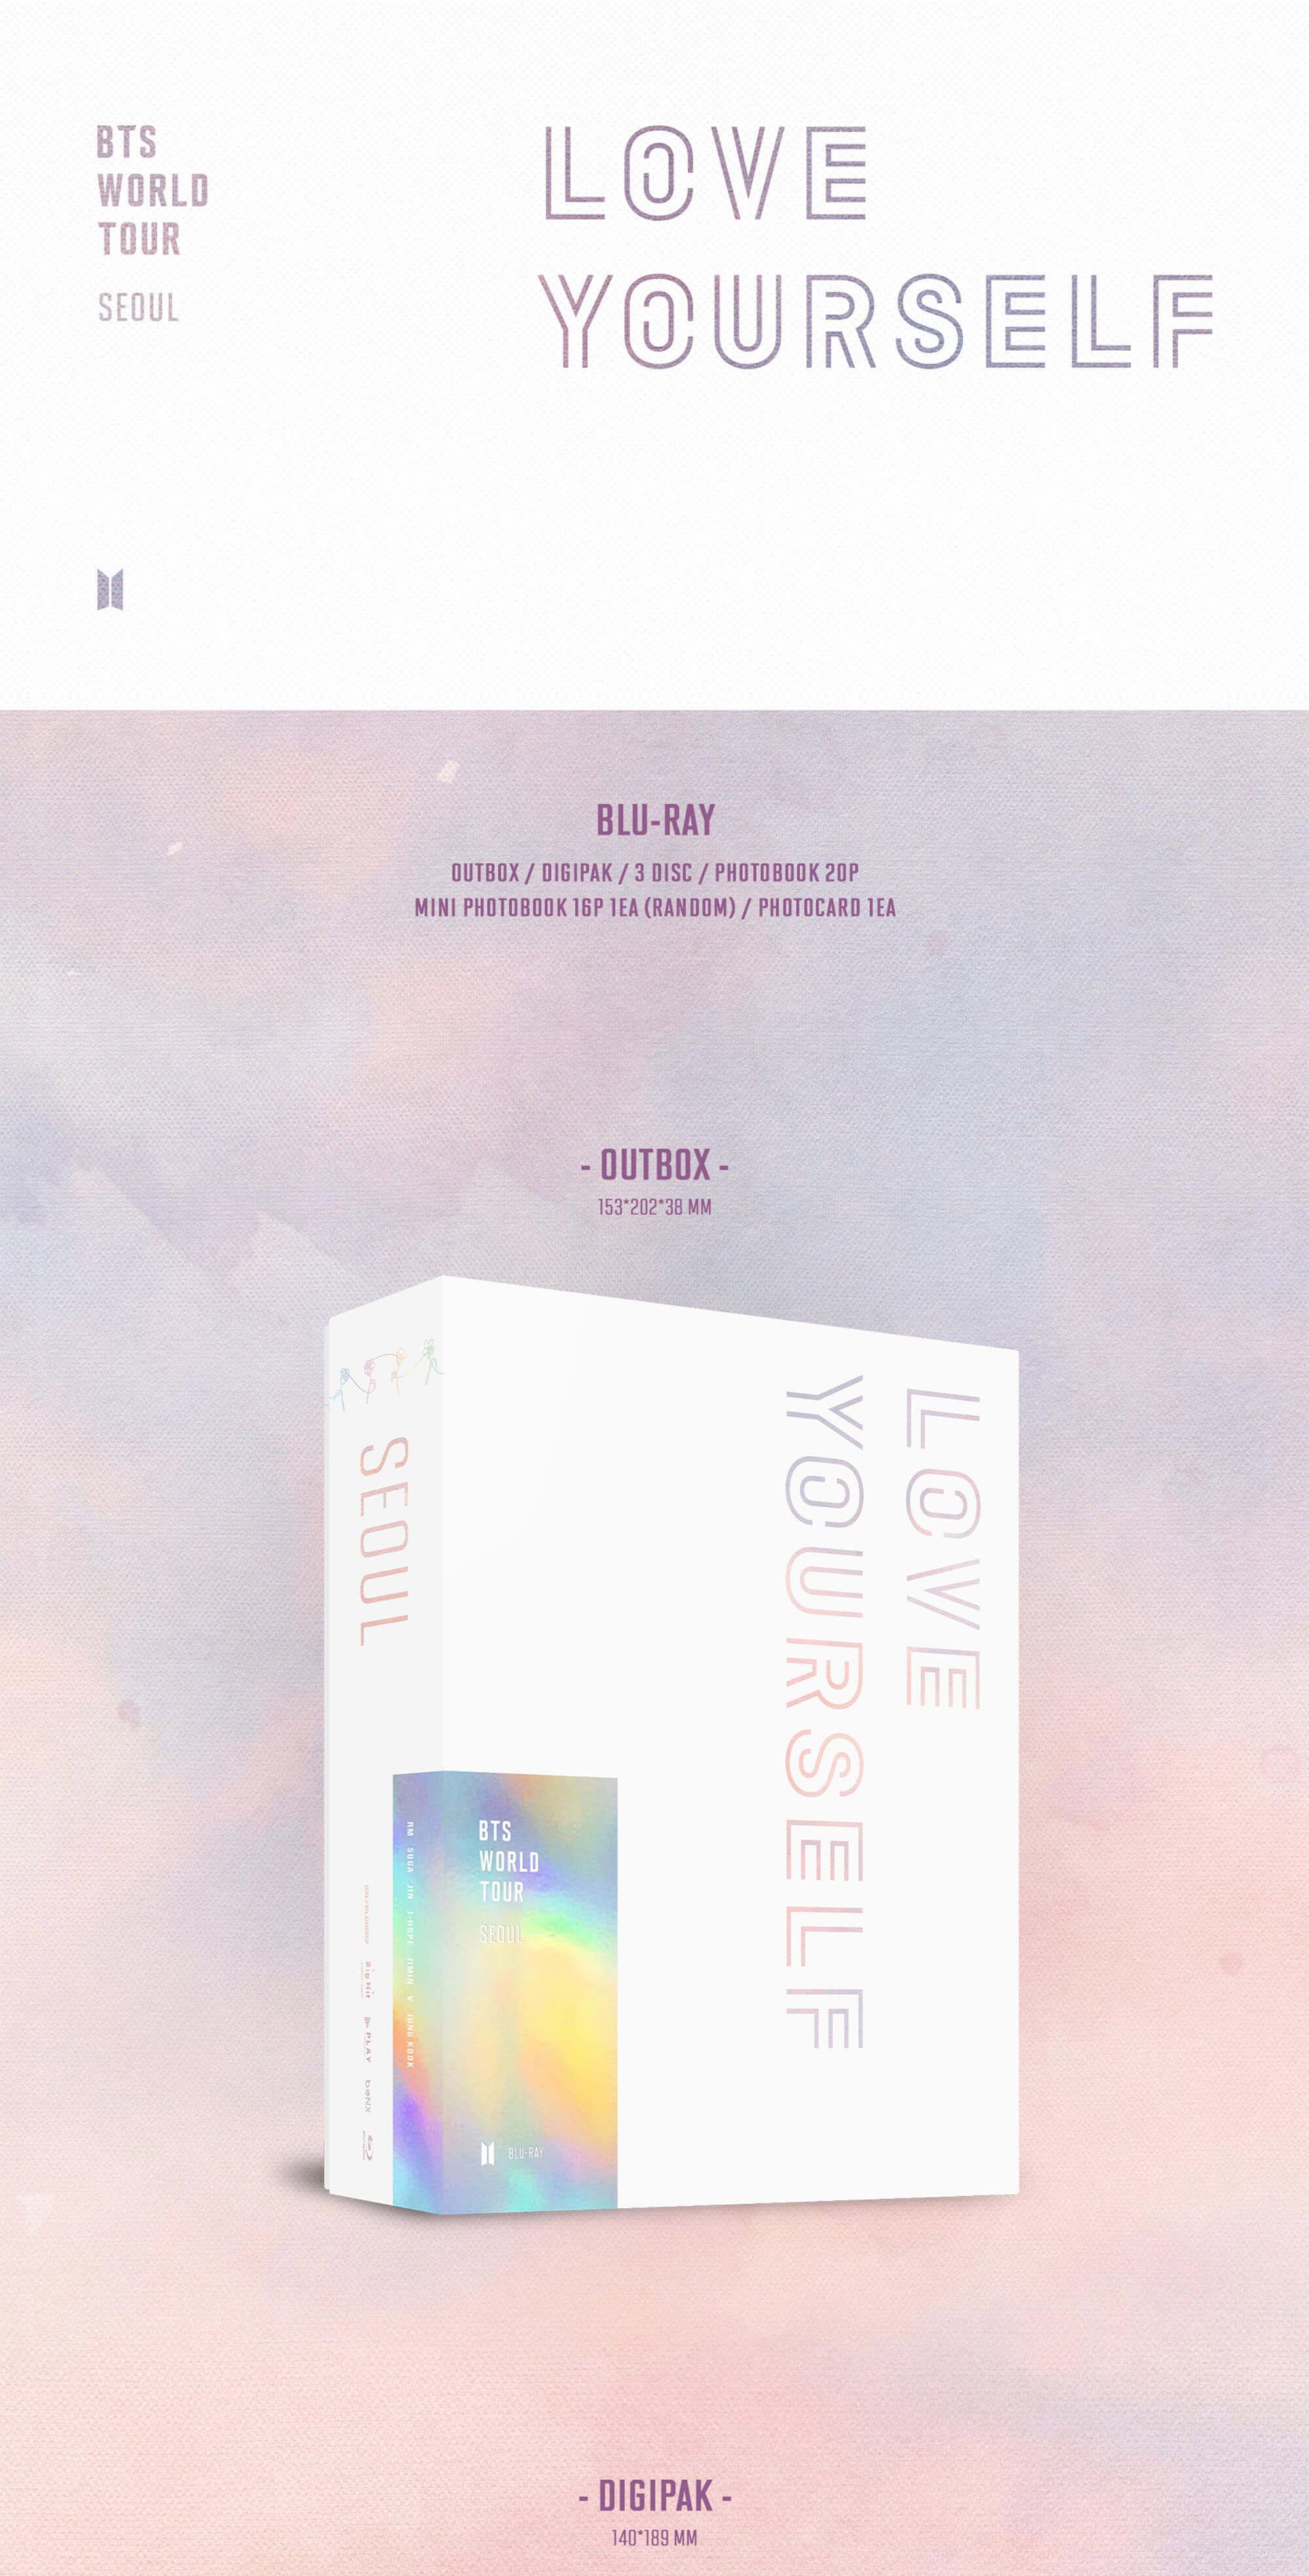 BTS LOVE YOURSELF SEOUL Blu-ray